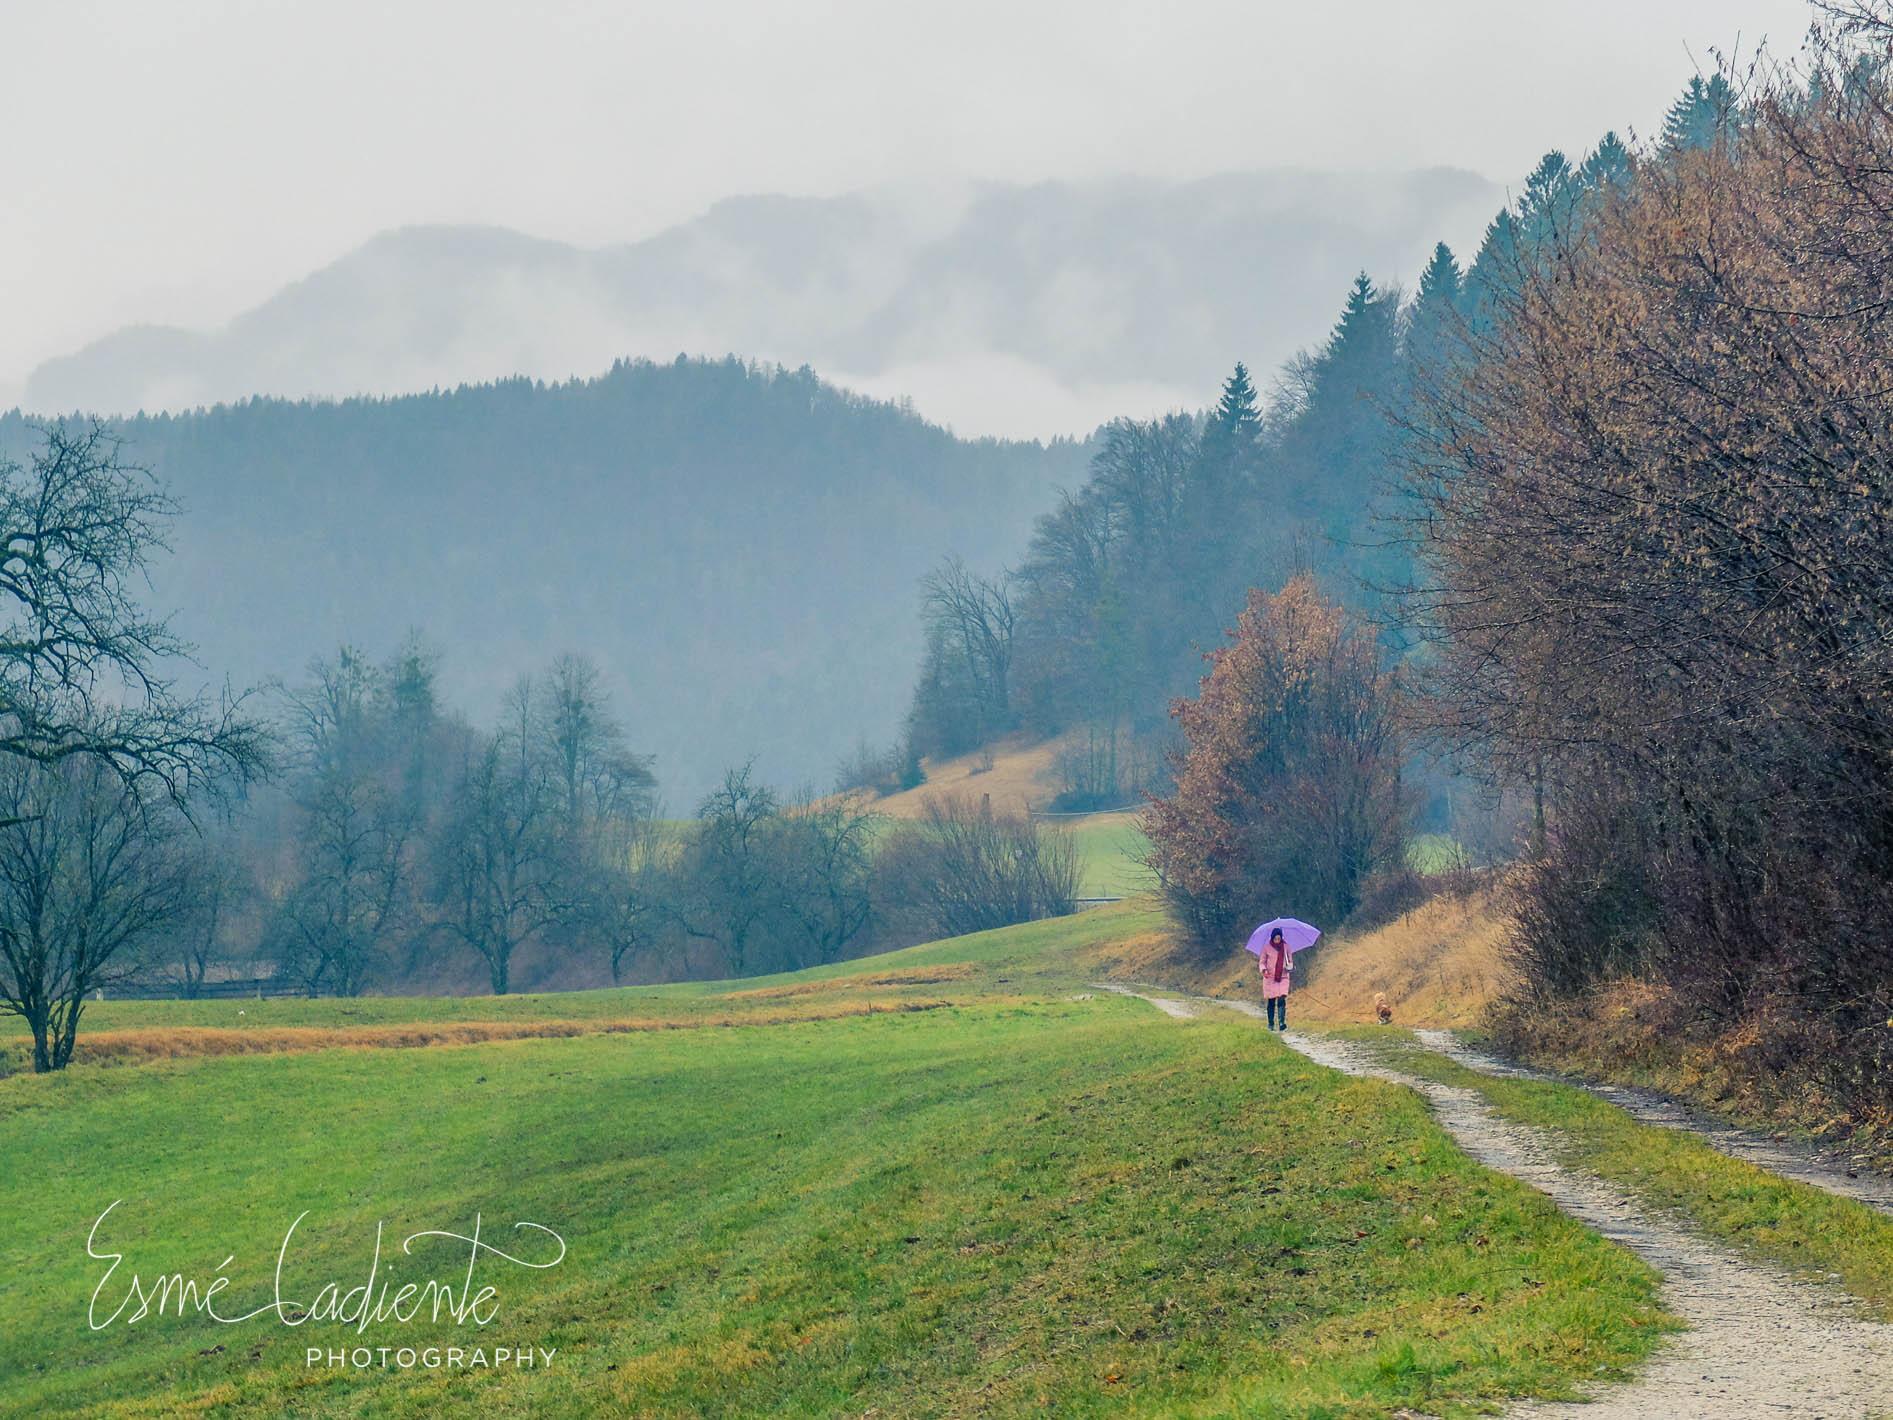 Mist envelopes the emerald valley